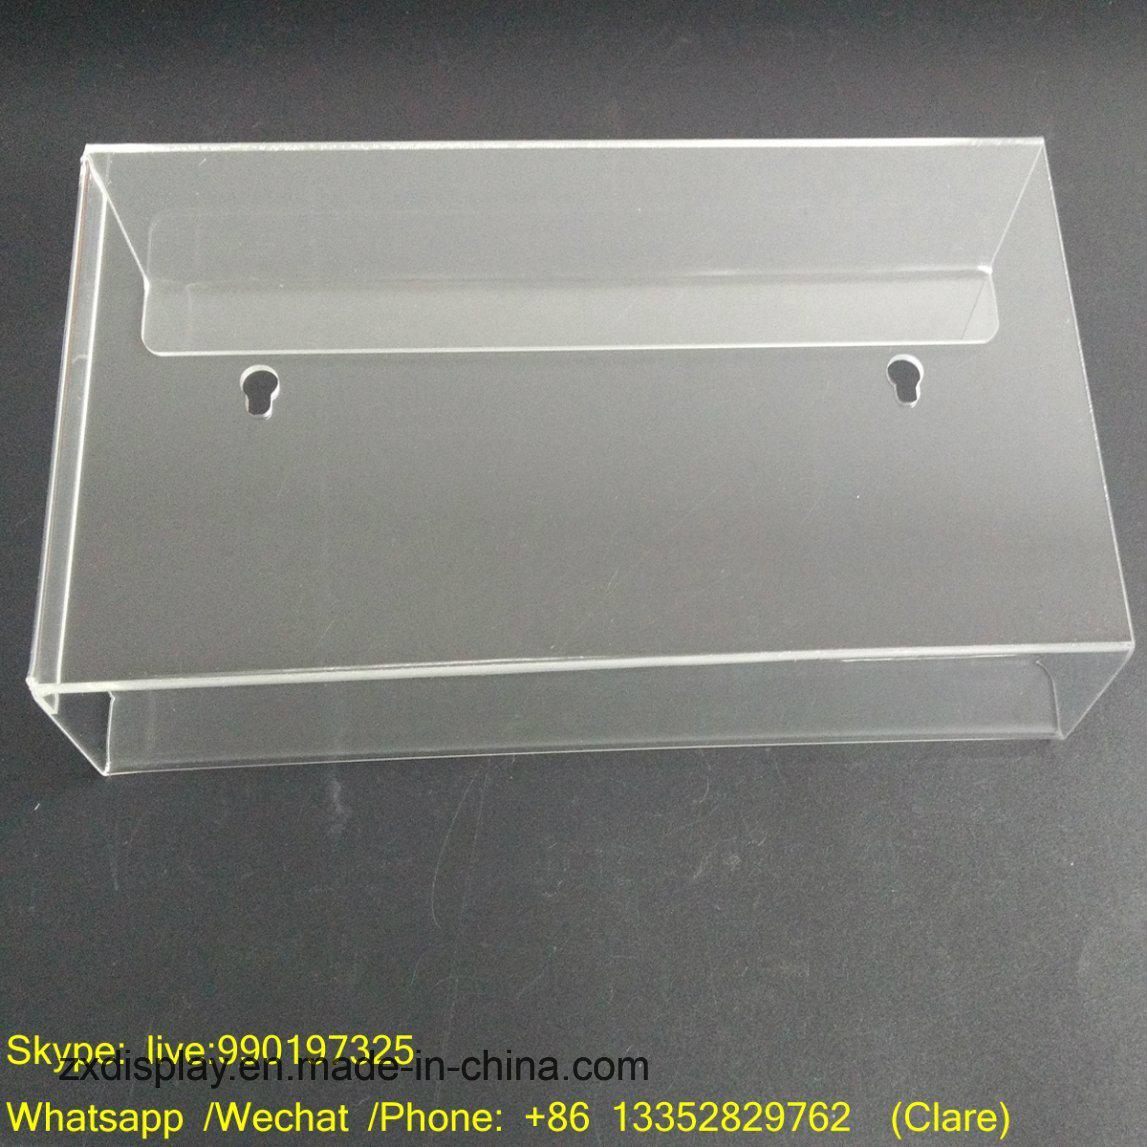 China Wall Mounted Acrylic Tissue Box Holder with Factory ... on Wall Mounted Tissue Box Holder id=75528